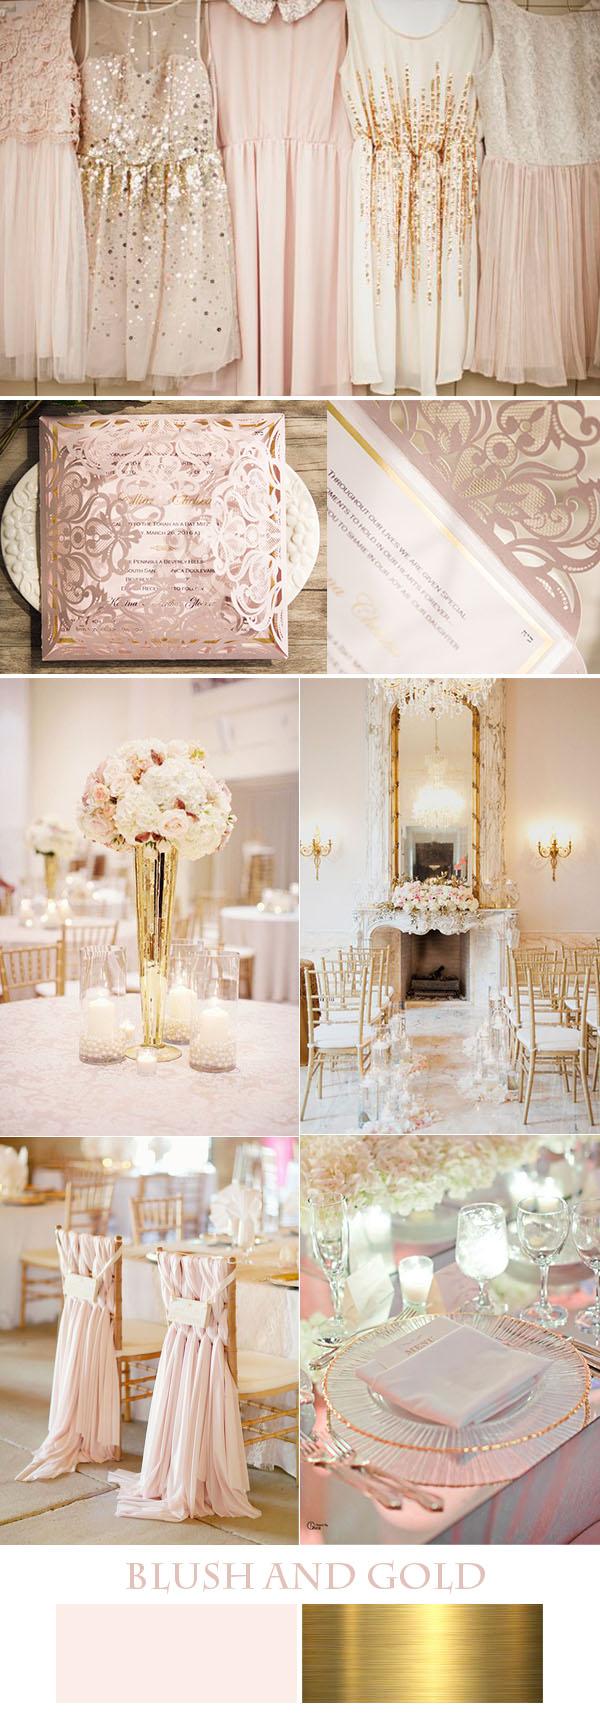 elegant-blush-pink-and-gold-wedding-ideas